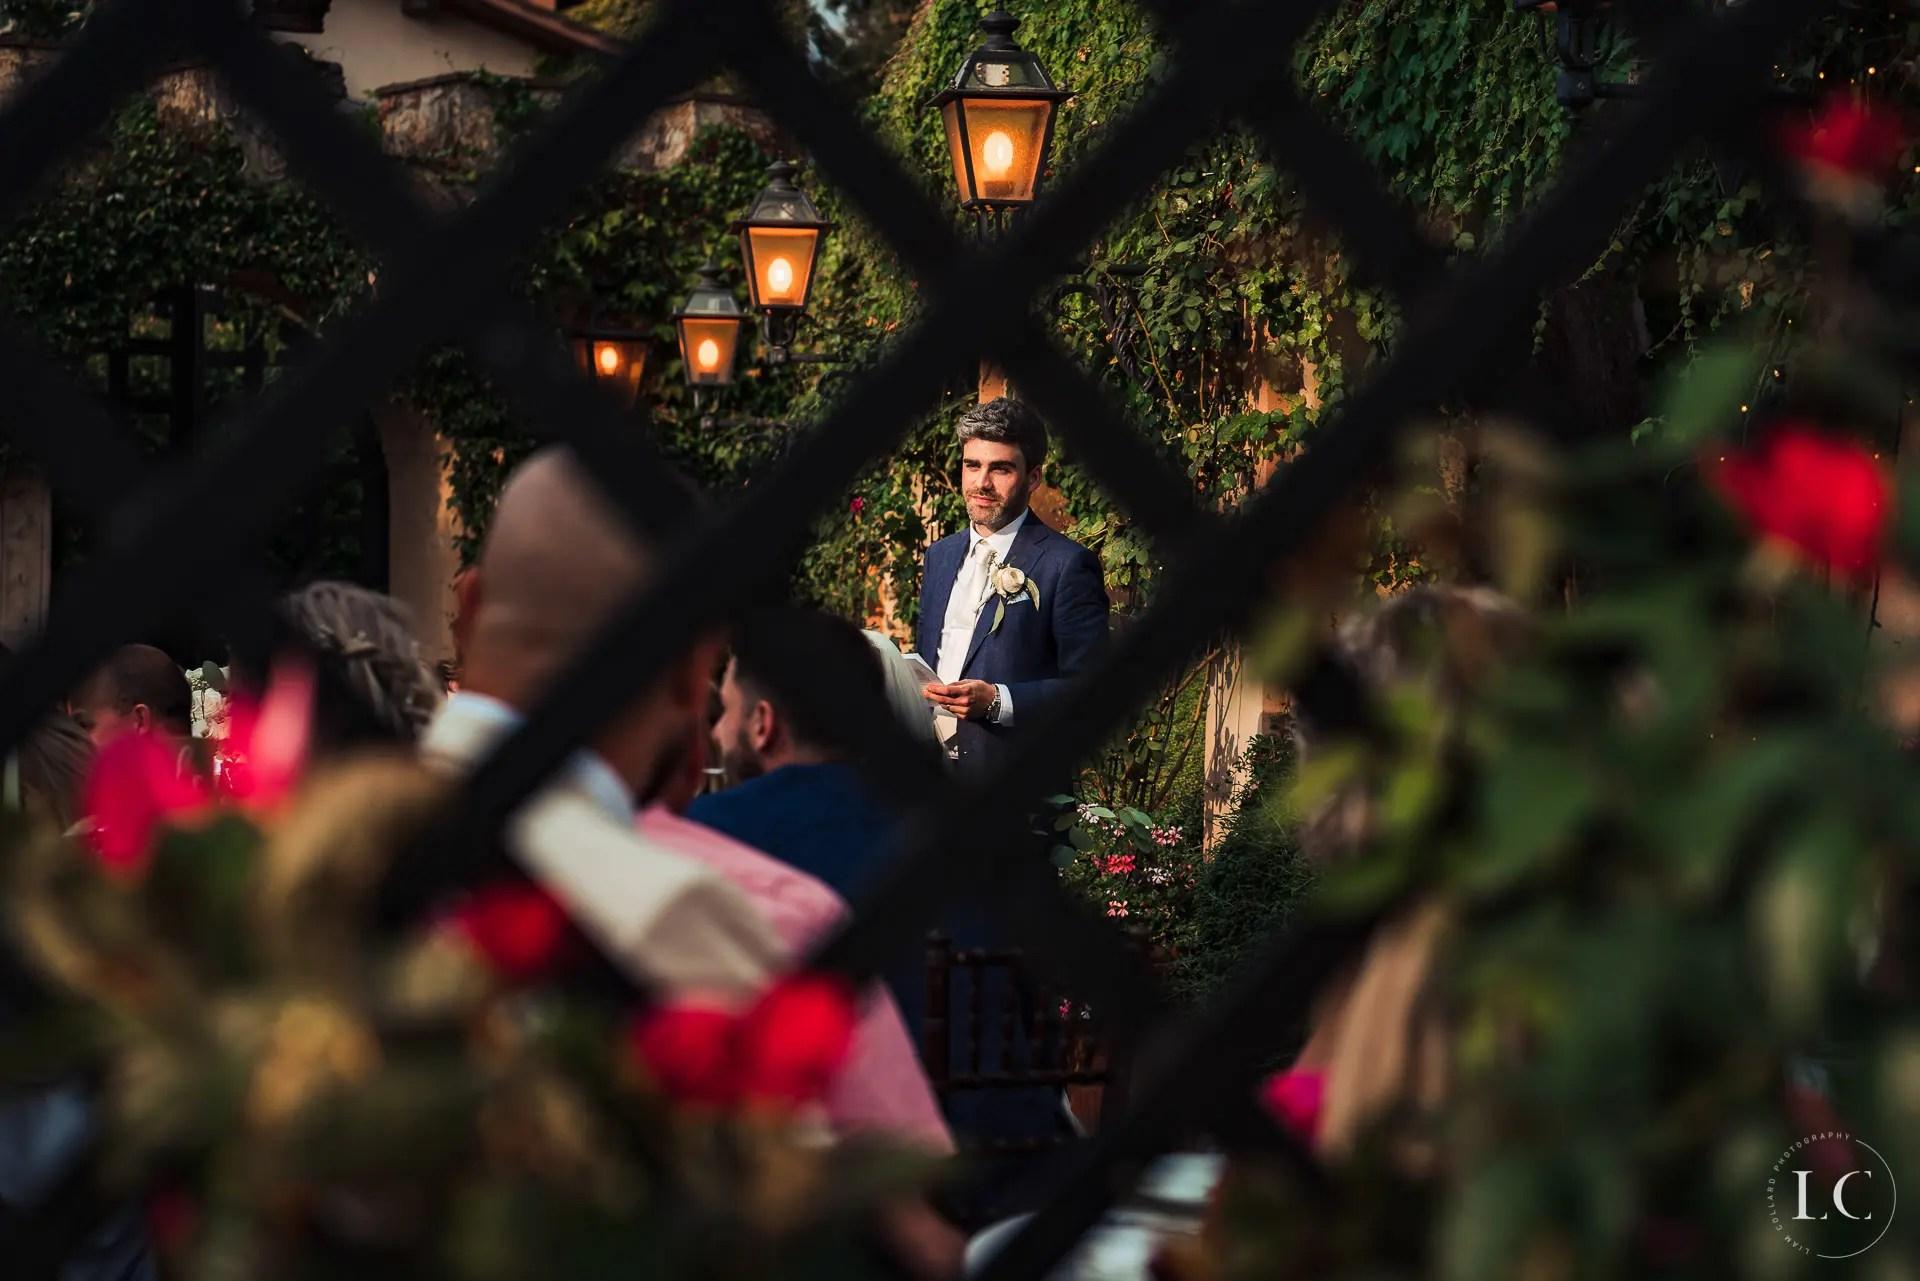 Abstract wedding image